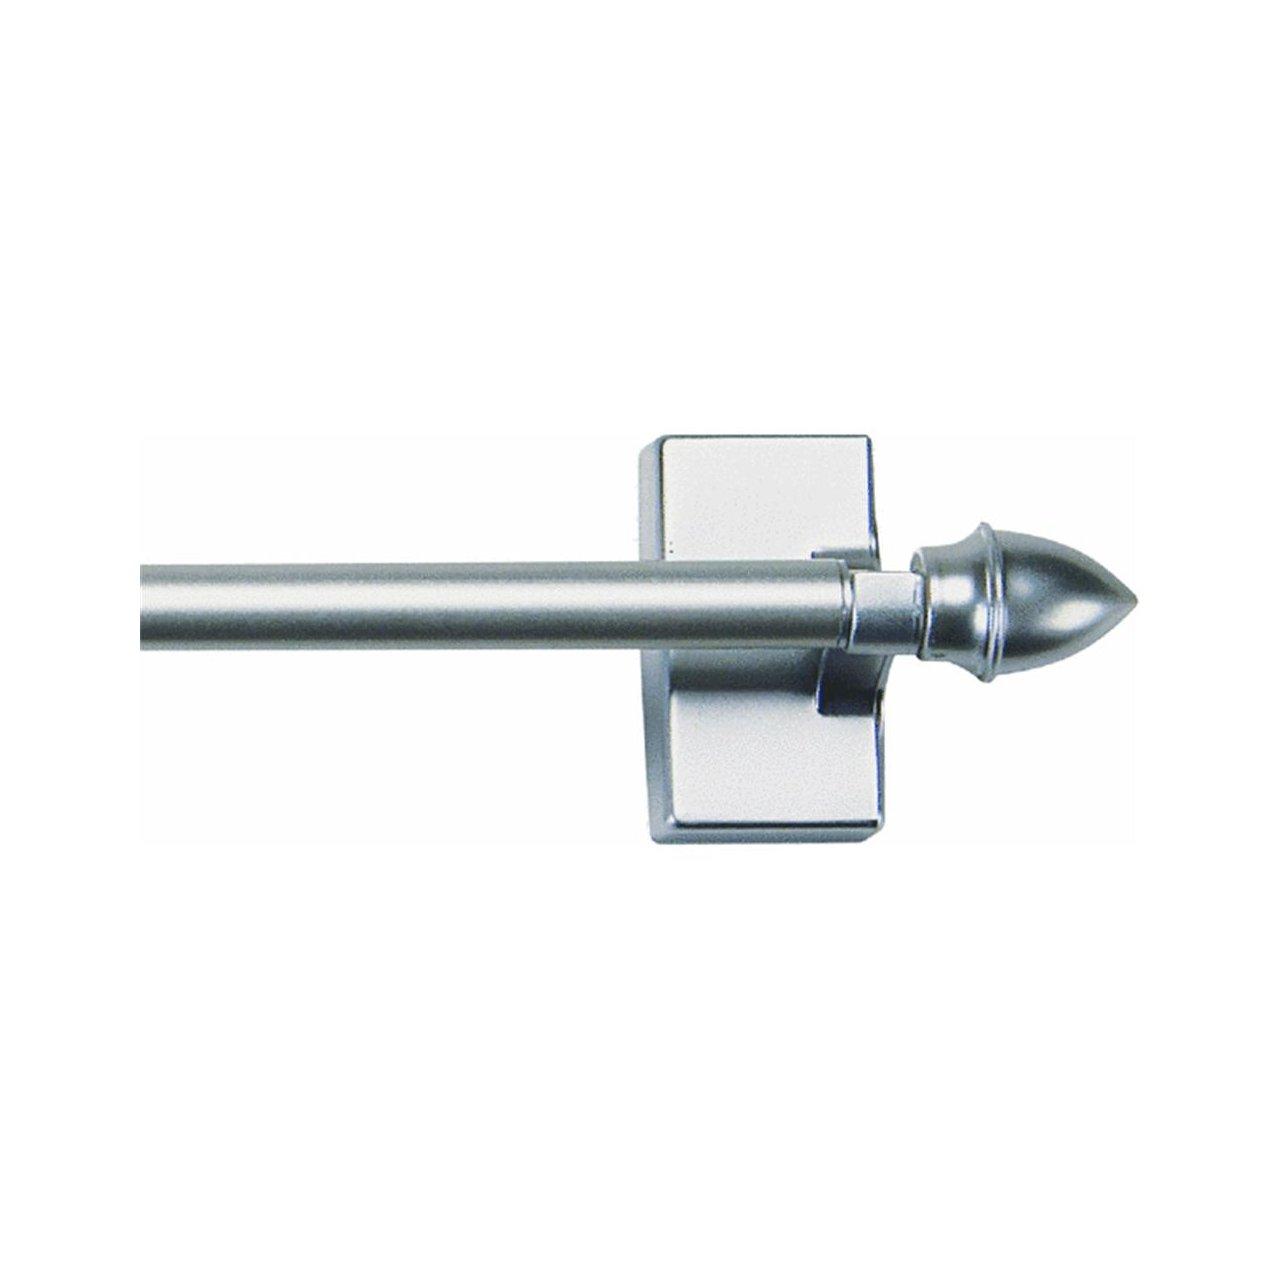 16 28 Magnetic Rod Set White With Brackets Curtain Bar Kitchen Refrigerator Ebay